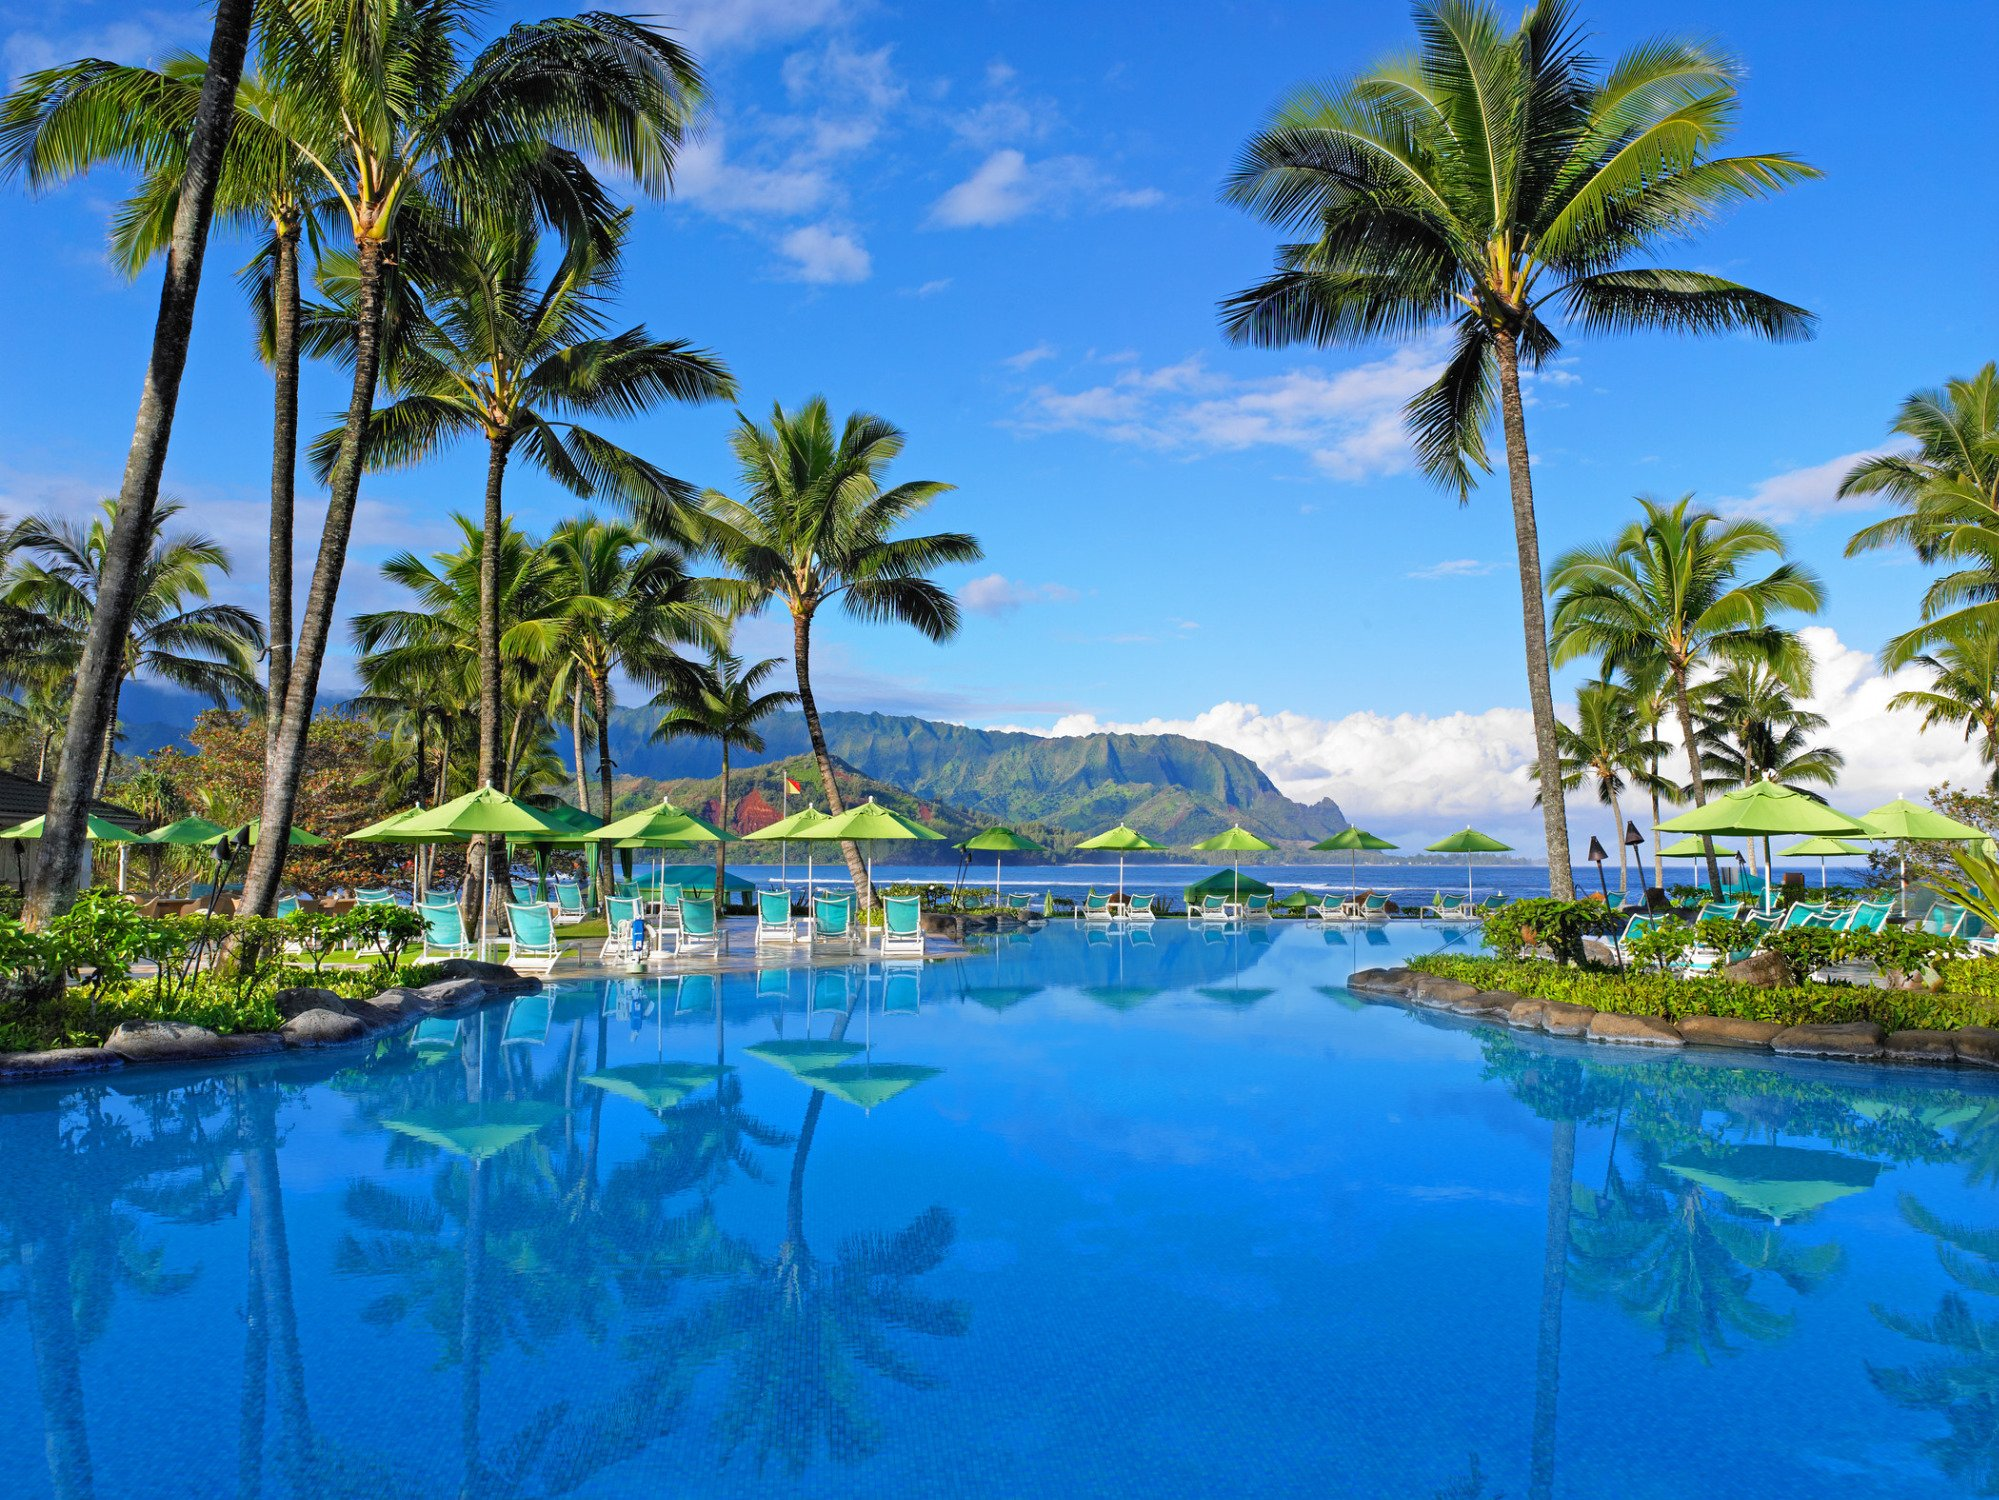 St Regis Princeville Resort Updated 2017 Prices